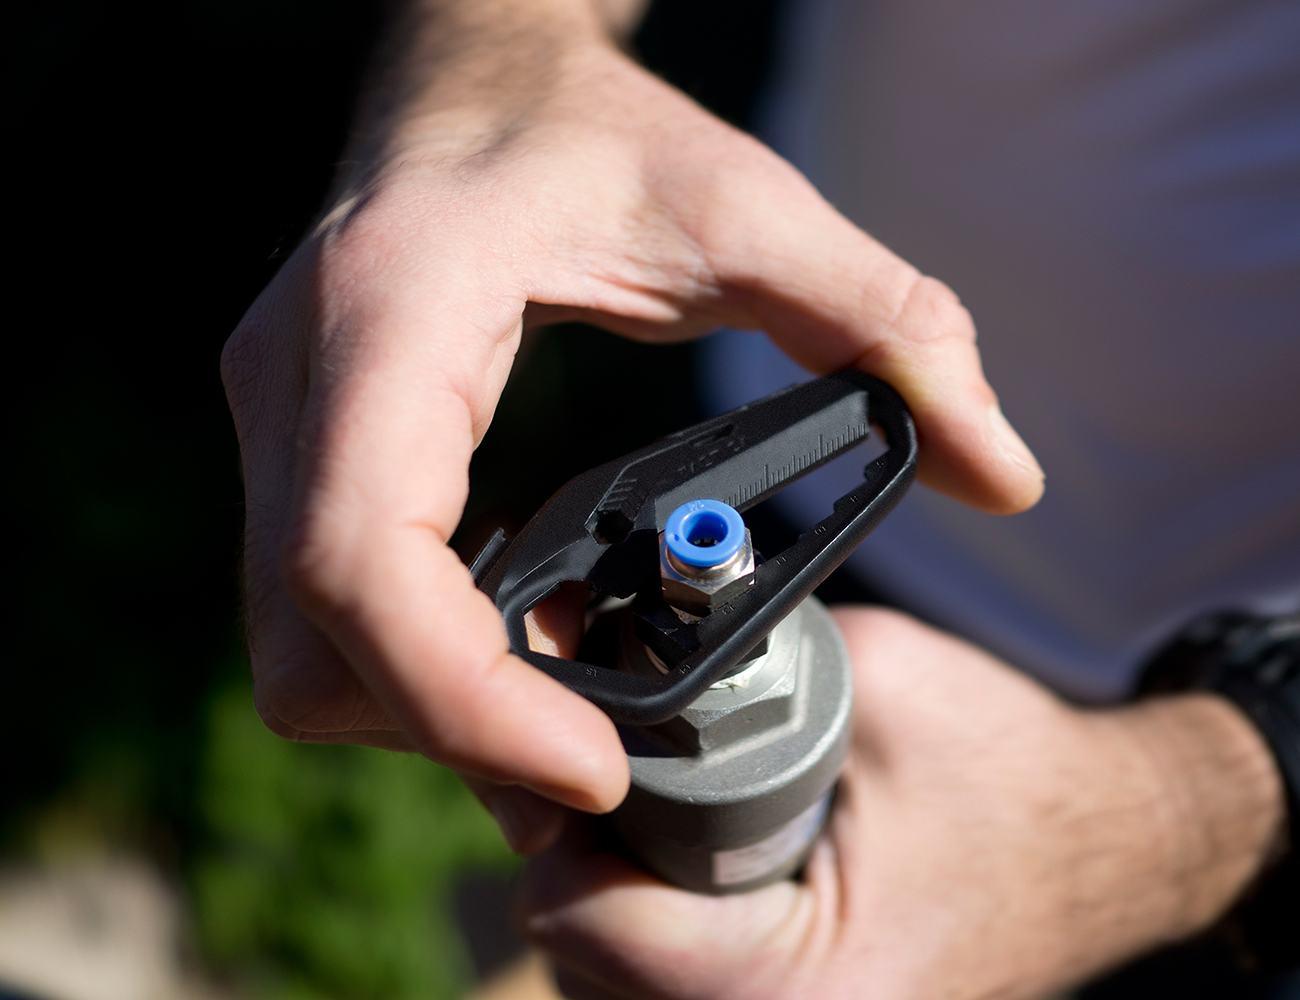 Talon – Ultra Lightweight Pocket Tool For Everyday Carry